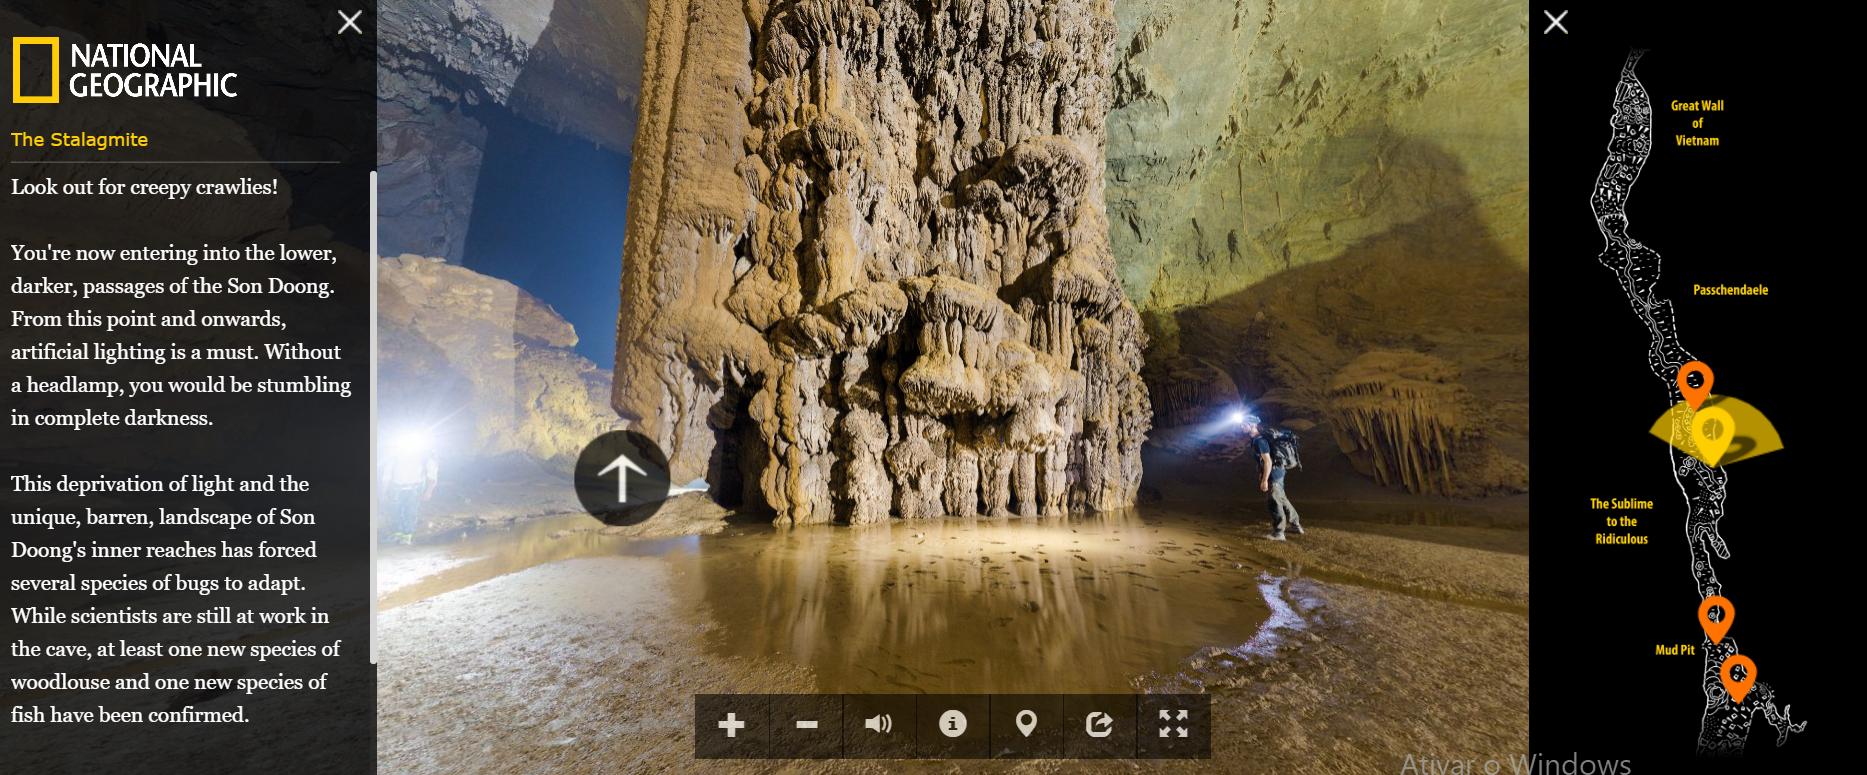 Caverna_soon_dung_6